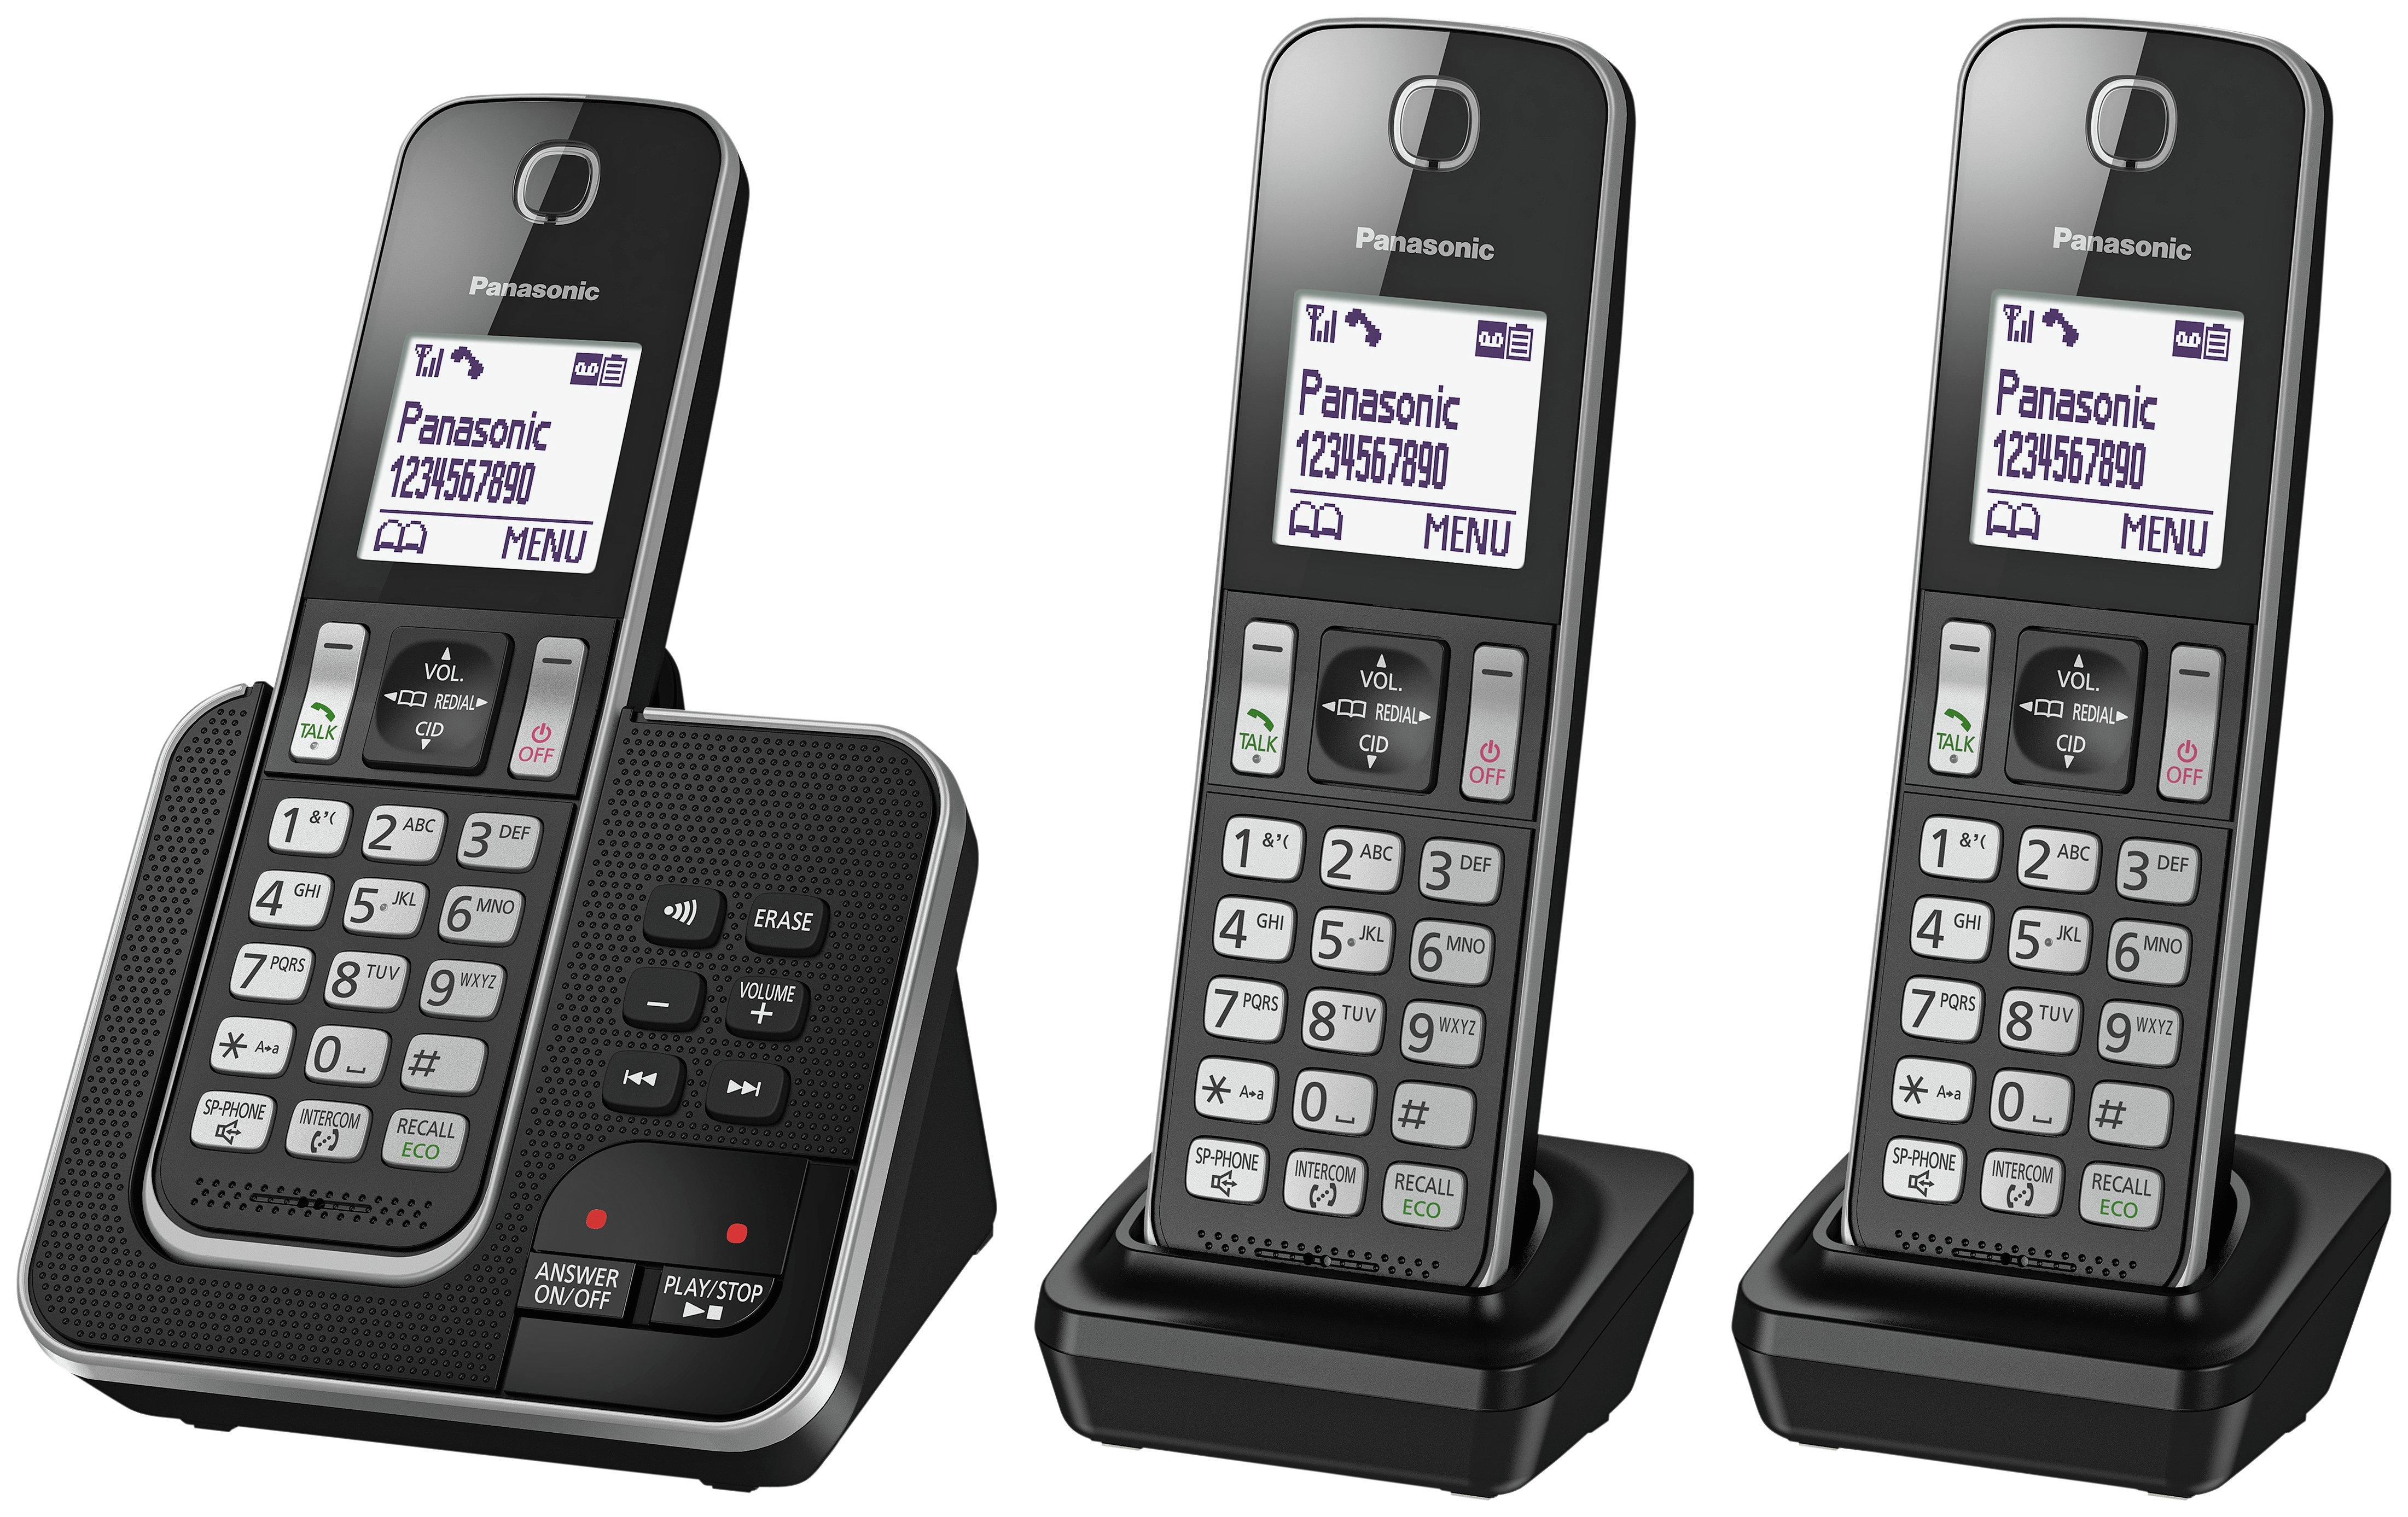 Panasonic Panasonic - Cordless Telephone & Answer Machine - Triple